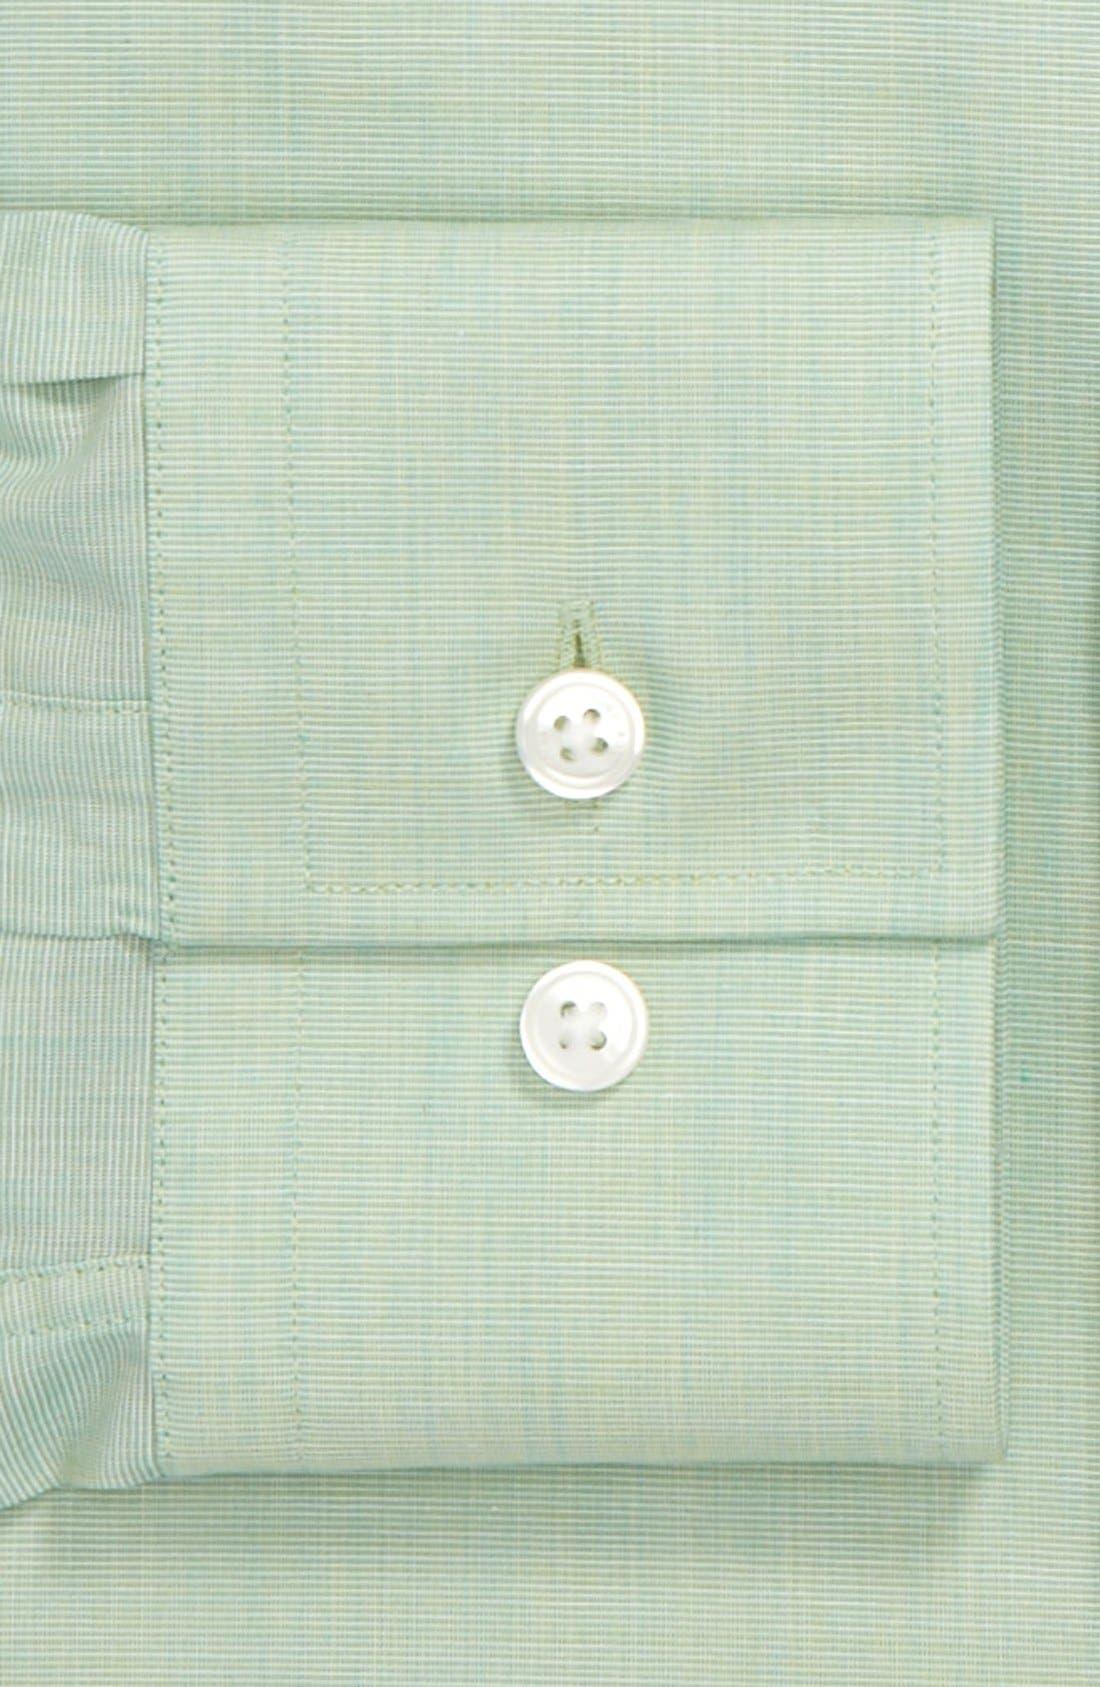 HUGO BOSS Slim Fit Dress Shirt,                             Alternate thumbnail 2, color,                             363